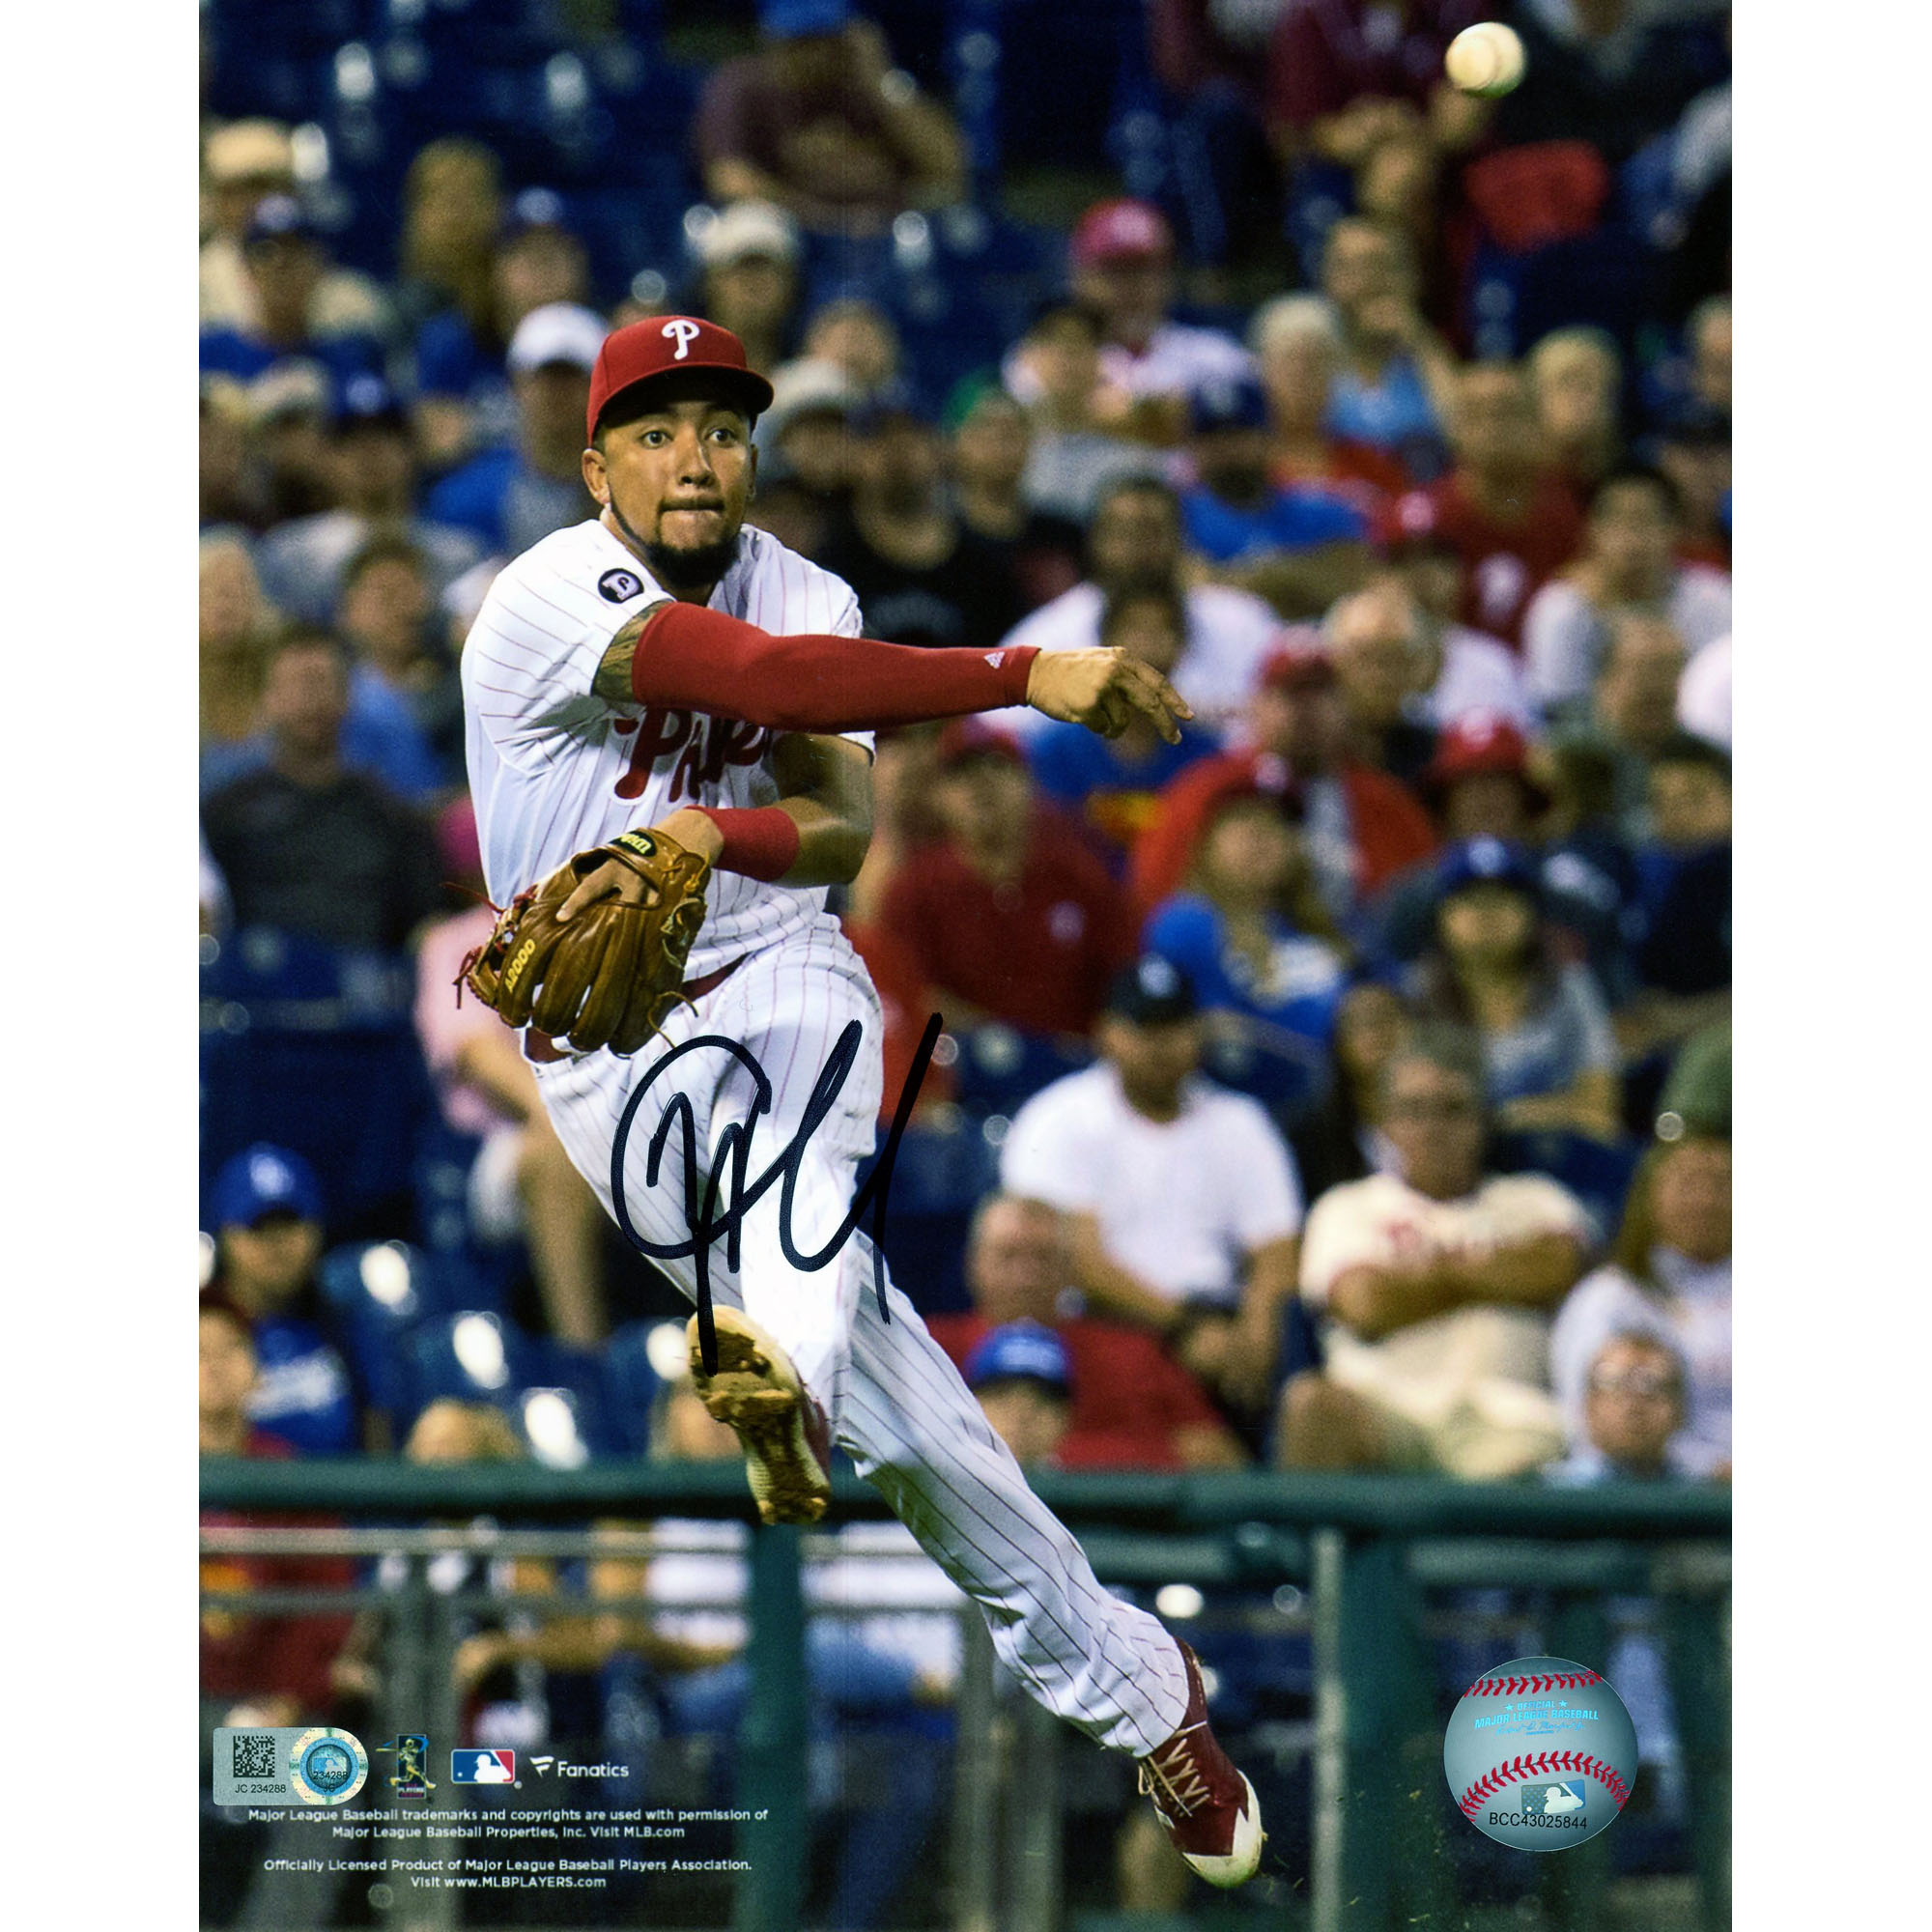 "JP Crawford Philadelphia Phillies Fanatics Authentic Autographed 8"" x 10"" Throwing Ball Photograph - No Size"